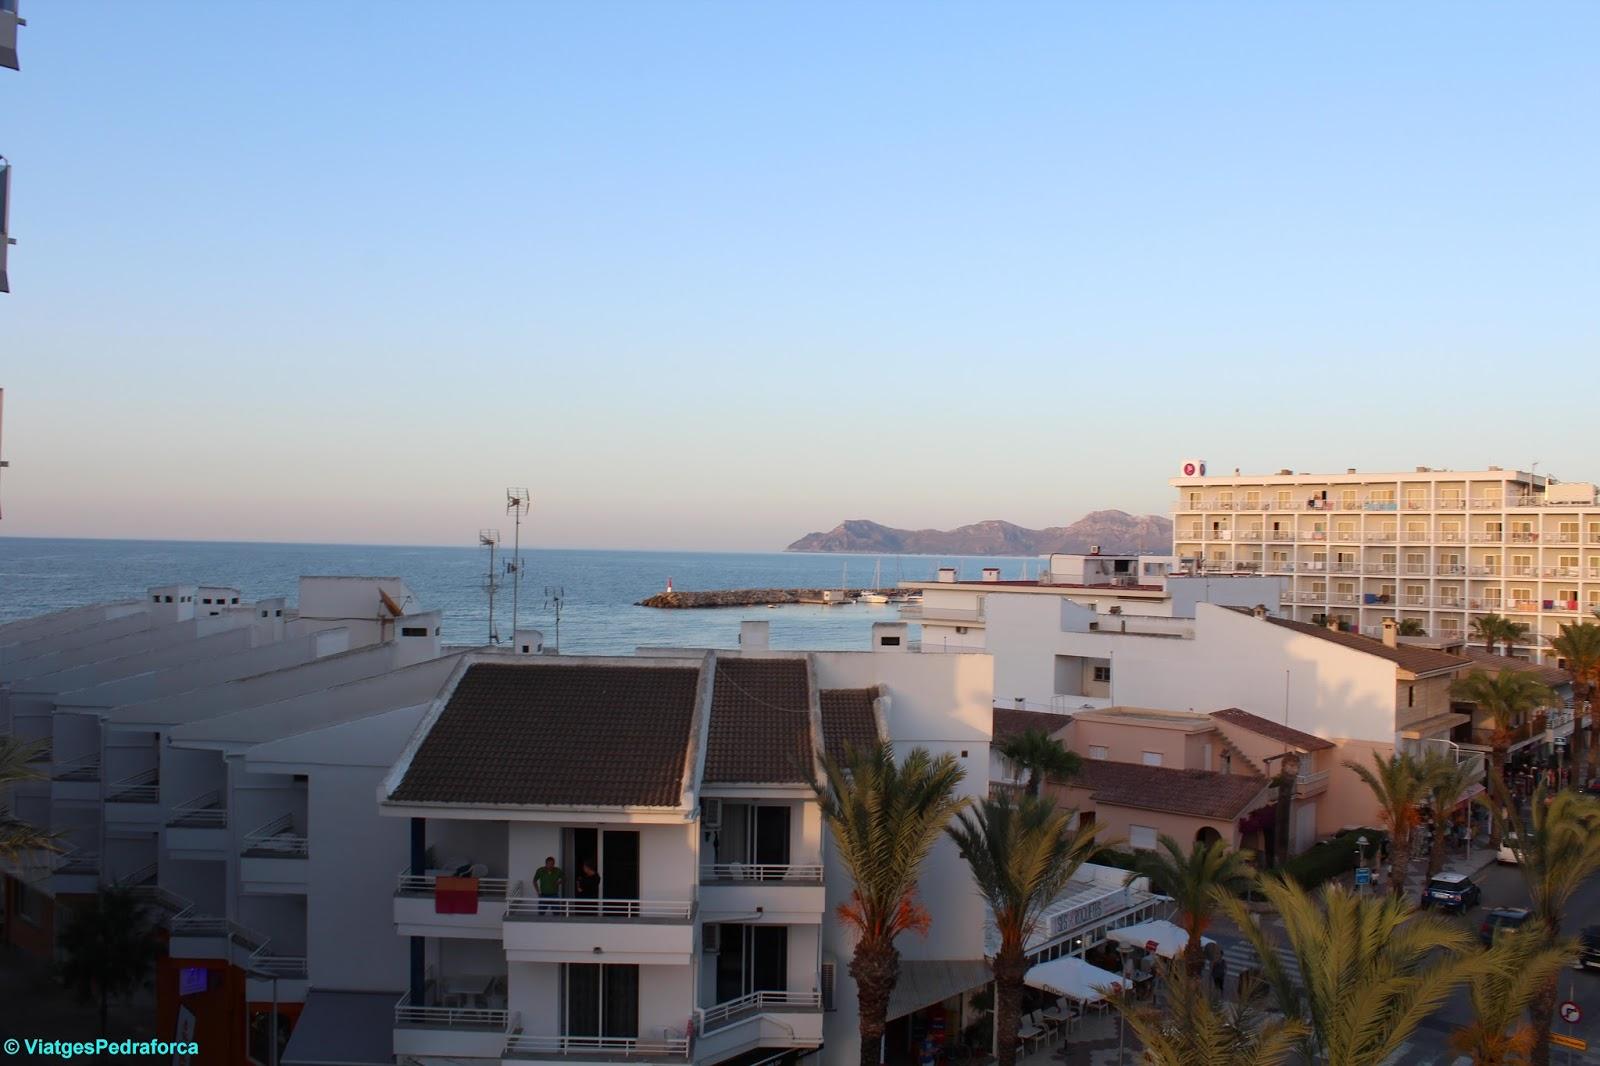 Mallorca, turisme de sol i platja, Balears, Països Catalans